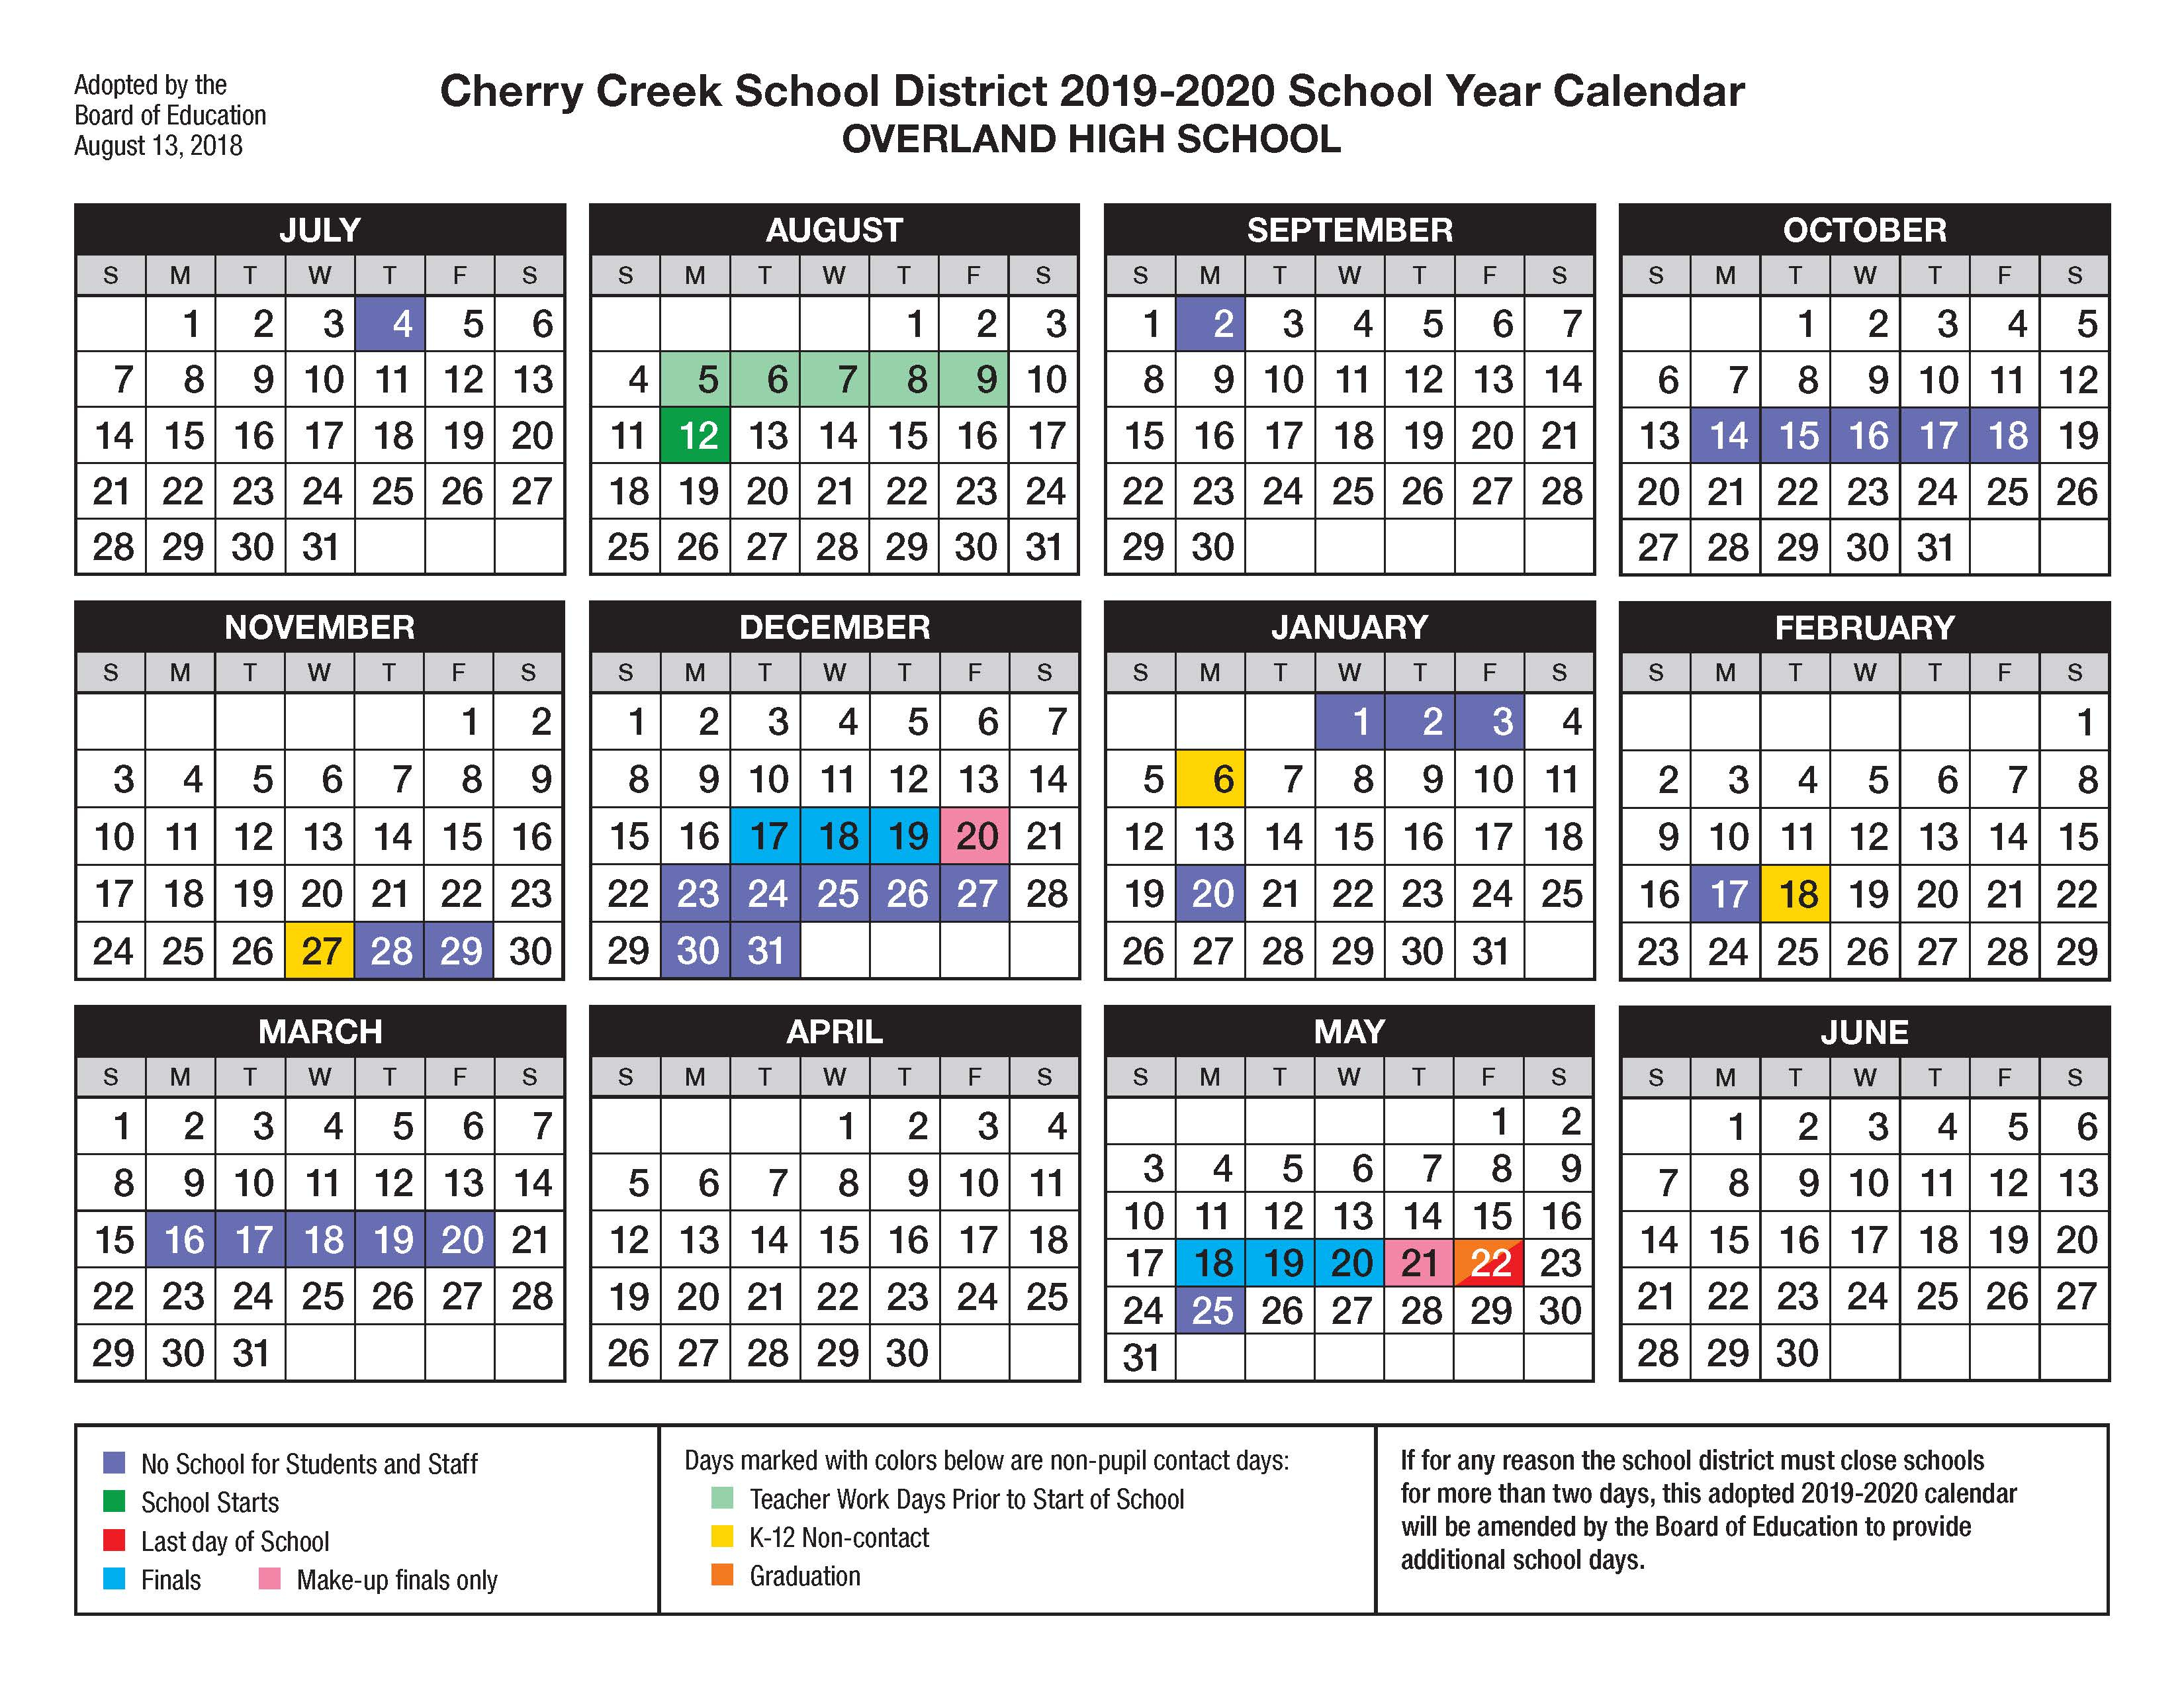 Overland High School / Calendar Regarding Walnut Hills Highchool Calendar